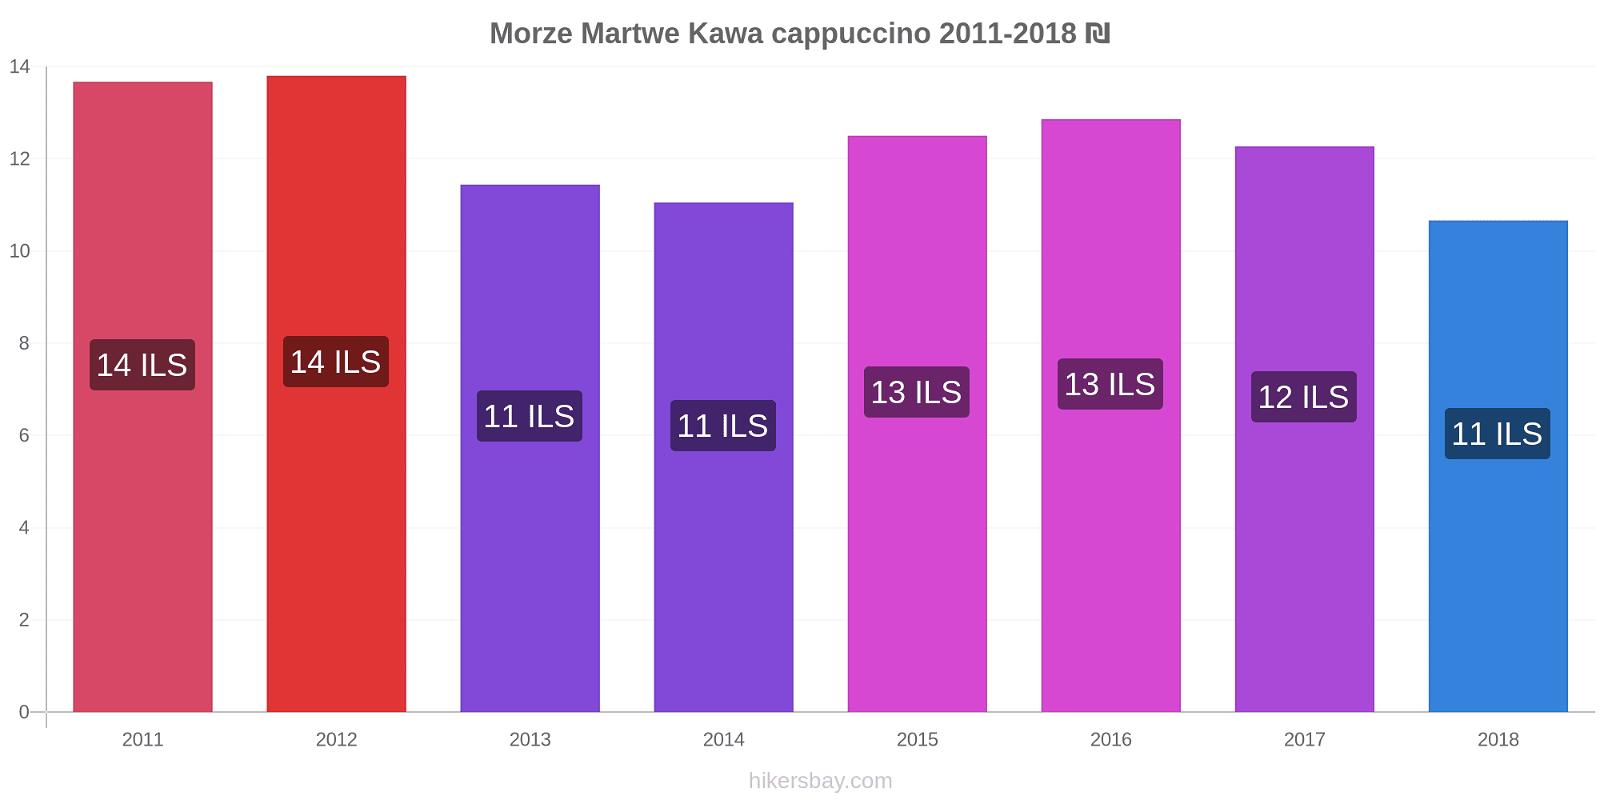 Morze Martwe zmiany cen Kawa cappuccino hikersbay.com